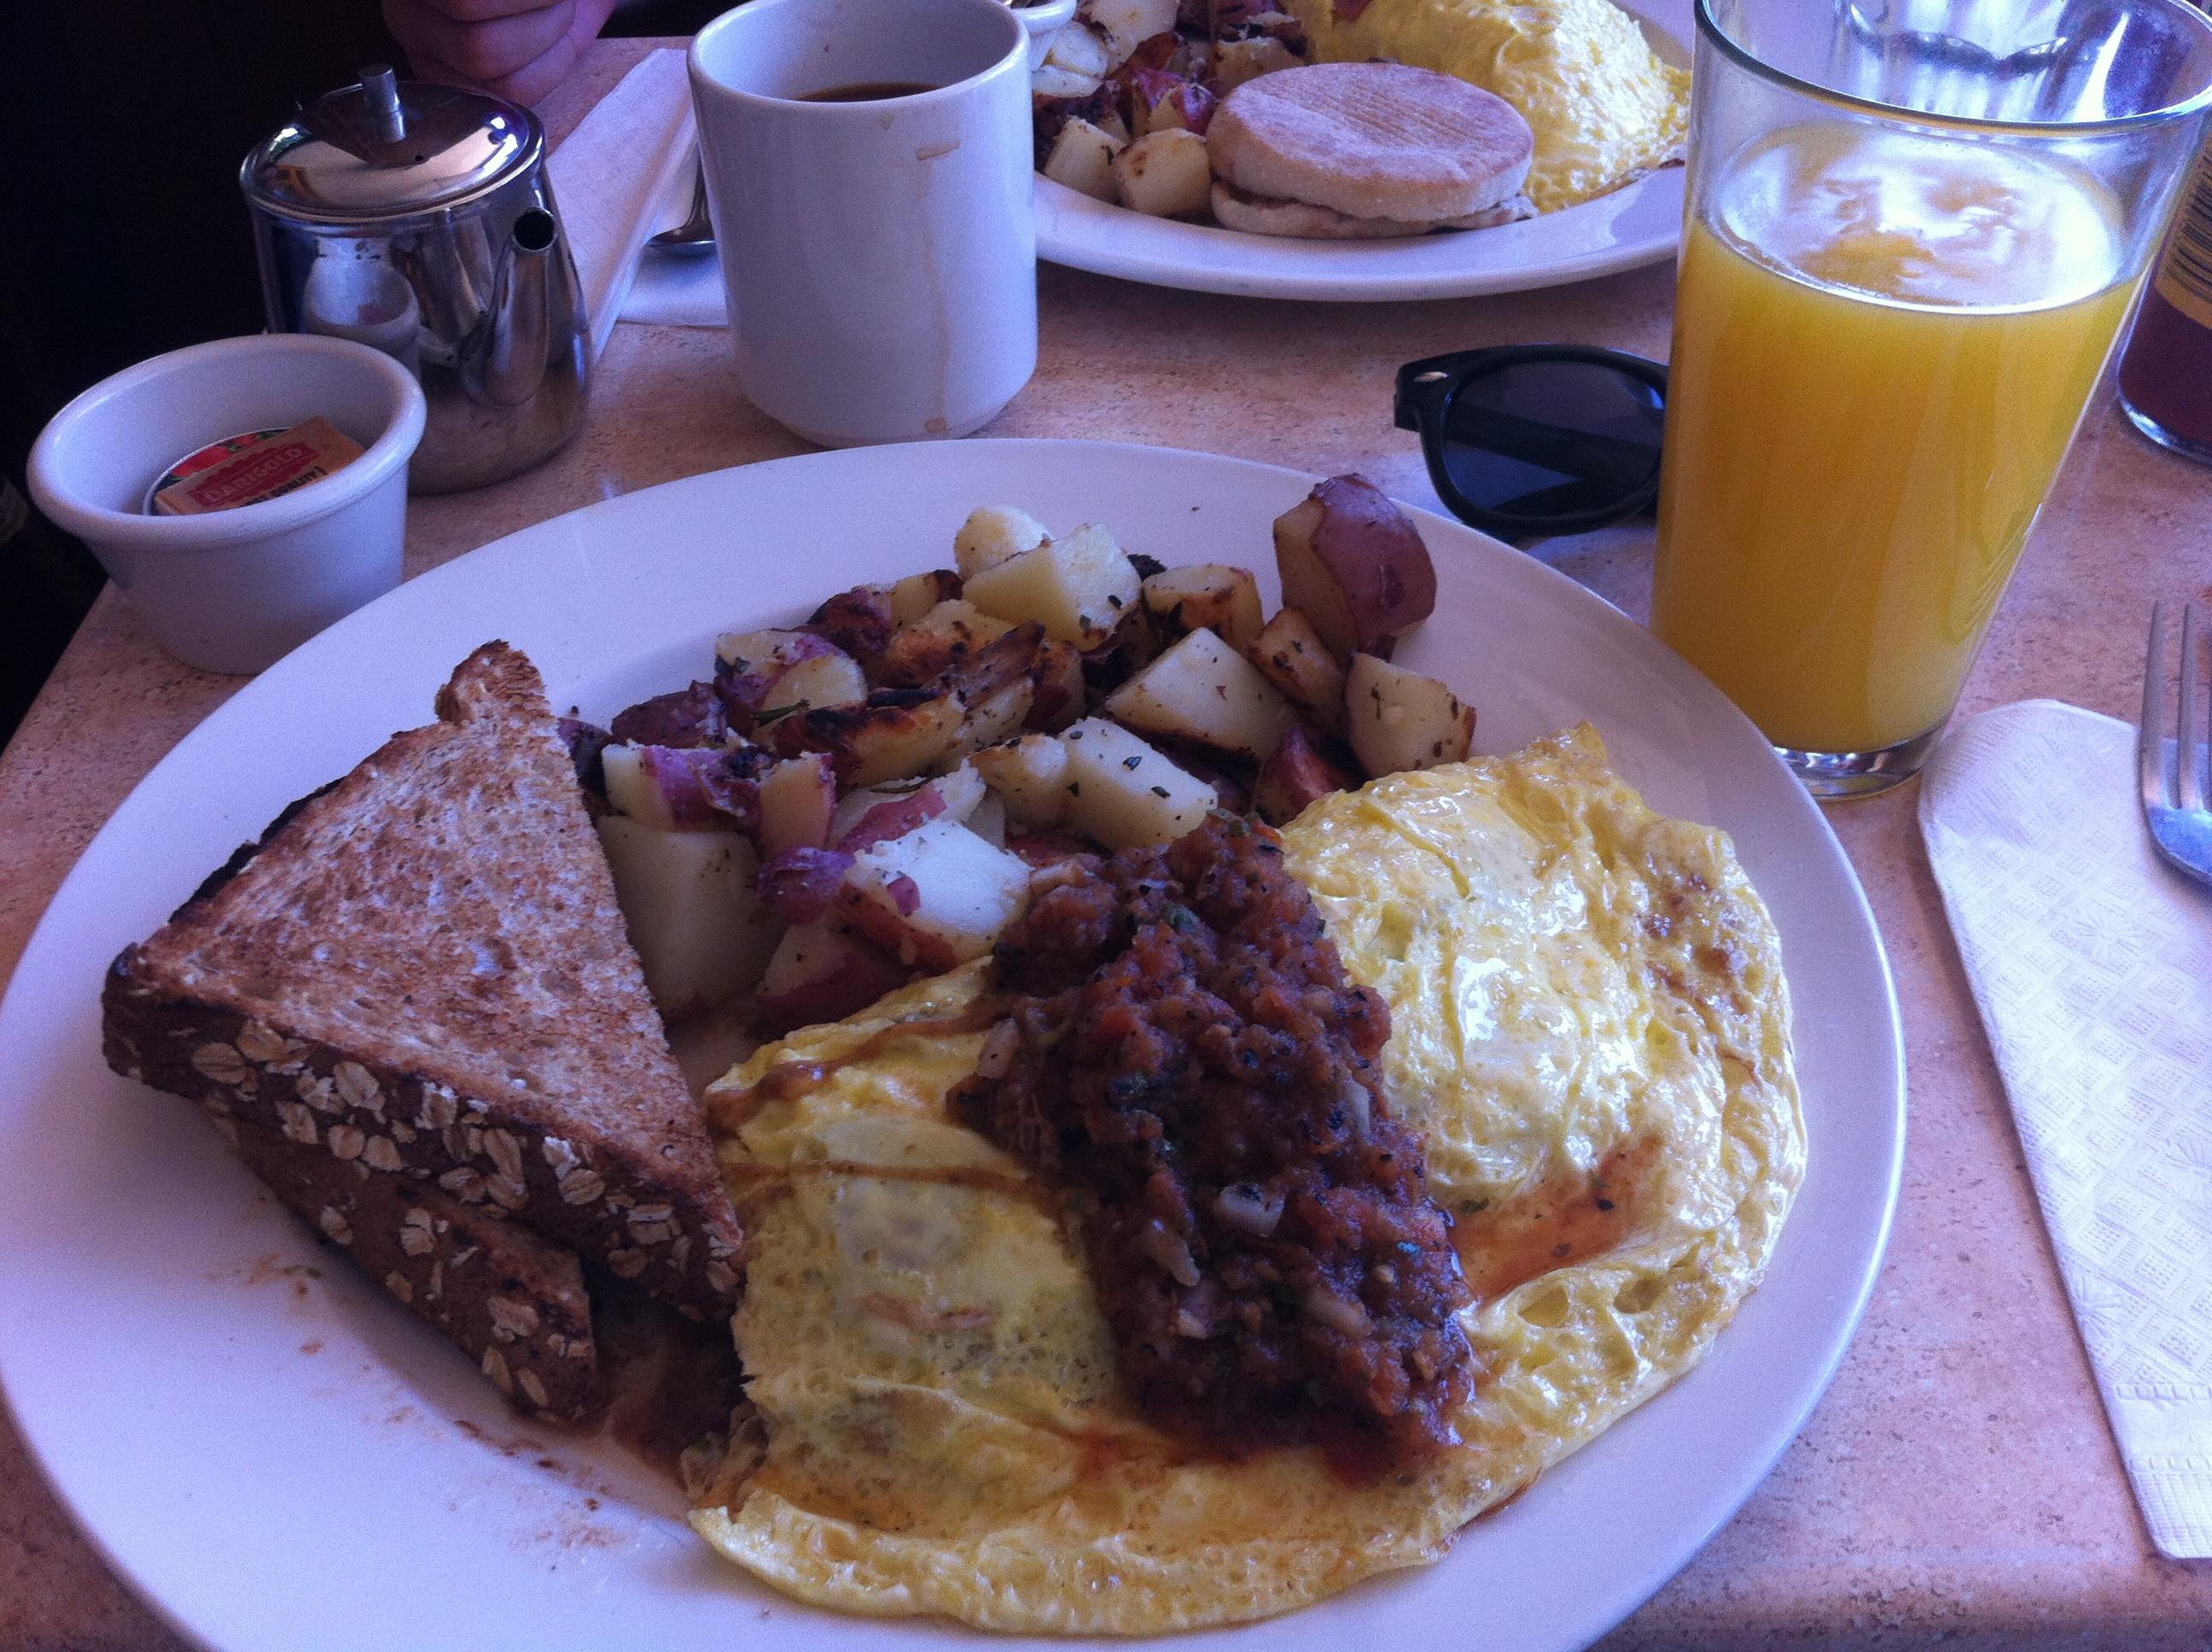 Just a light breakfast